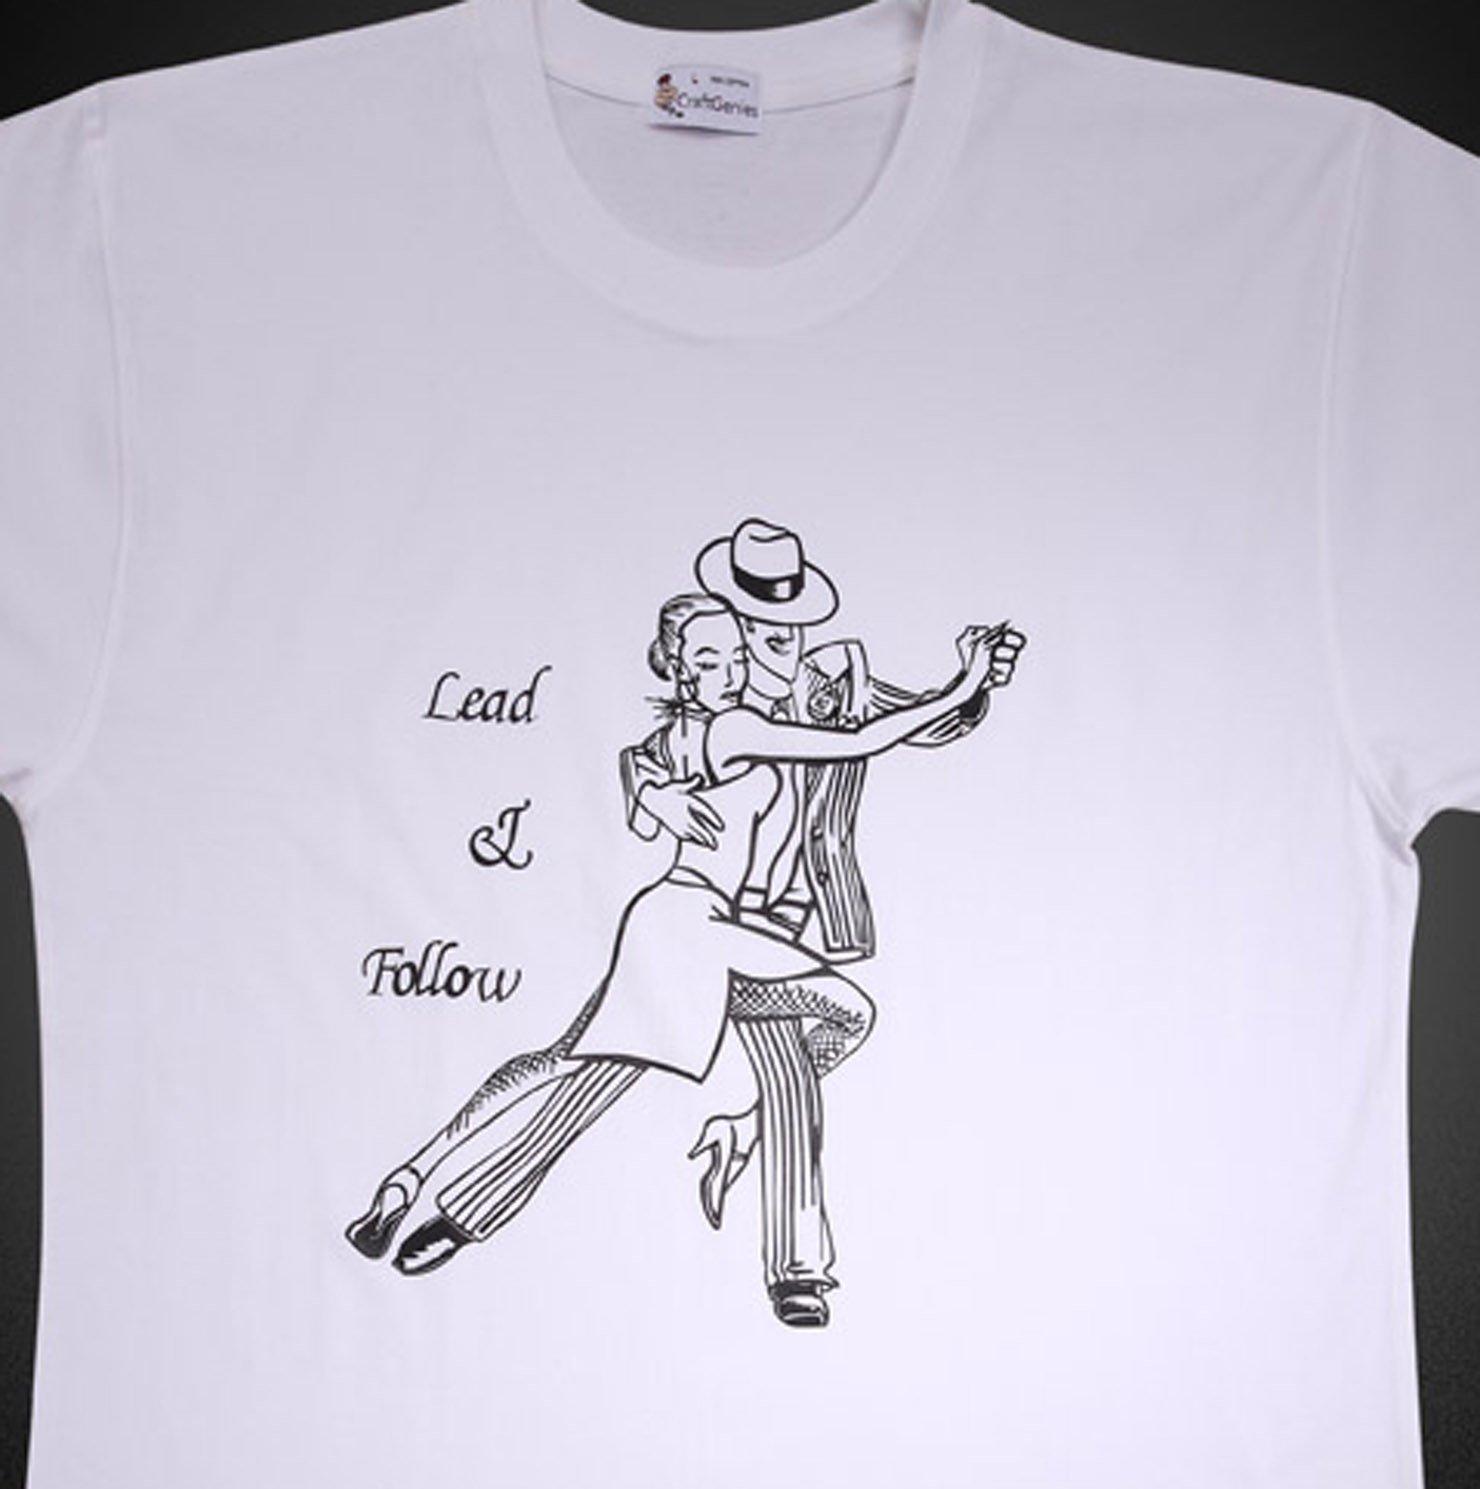 Dancing T Shirt Design for Men - New, Original  (Men's XL)